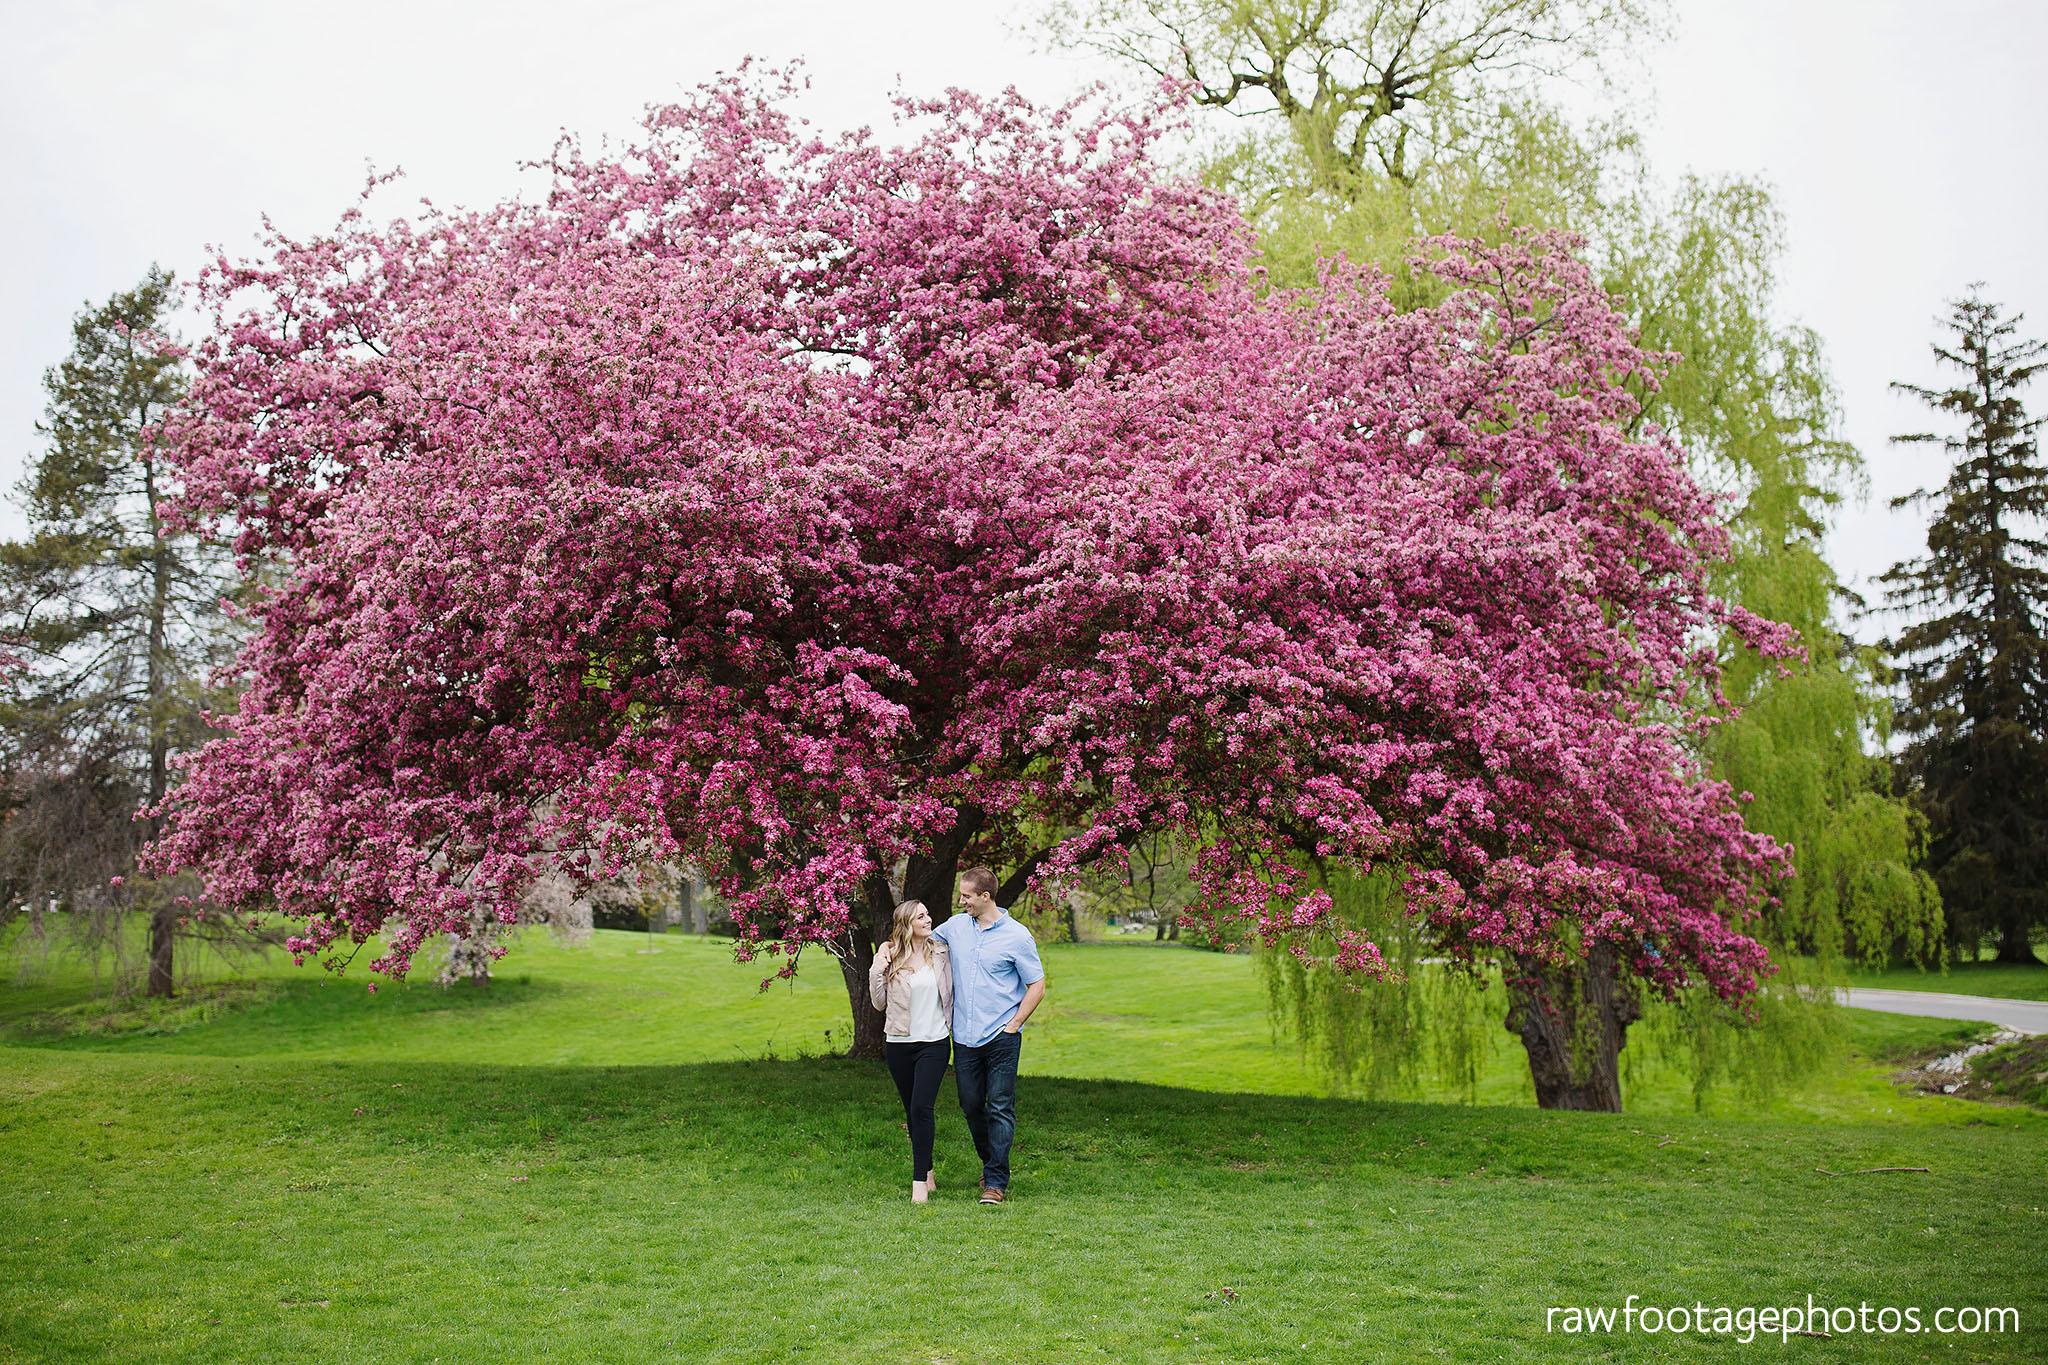 london_ontario_wedding_photographer-raw_footage_photography-engagement_session-engagement_photos-spring-blossoms-blooms001.jpg